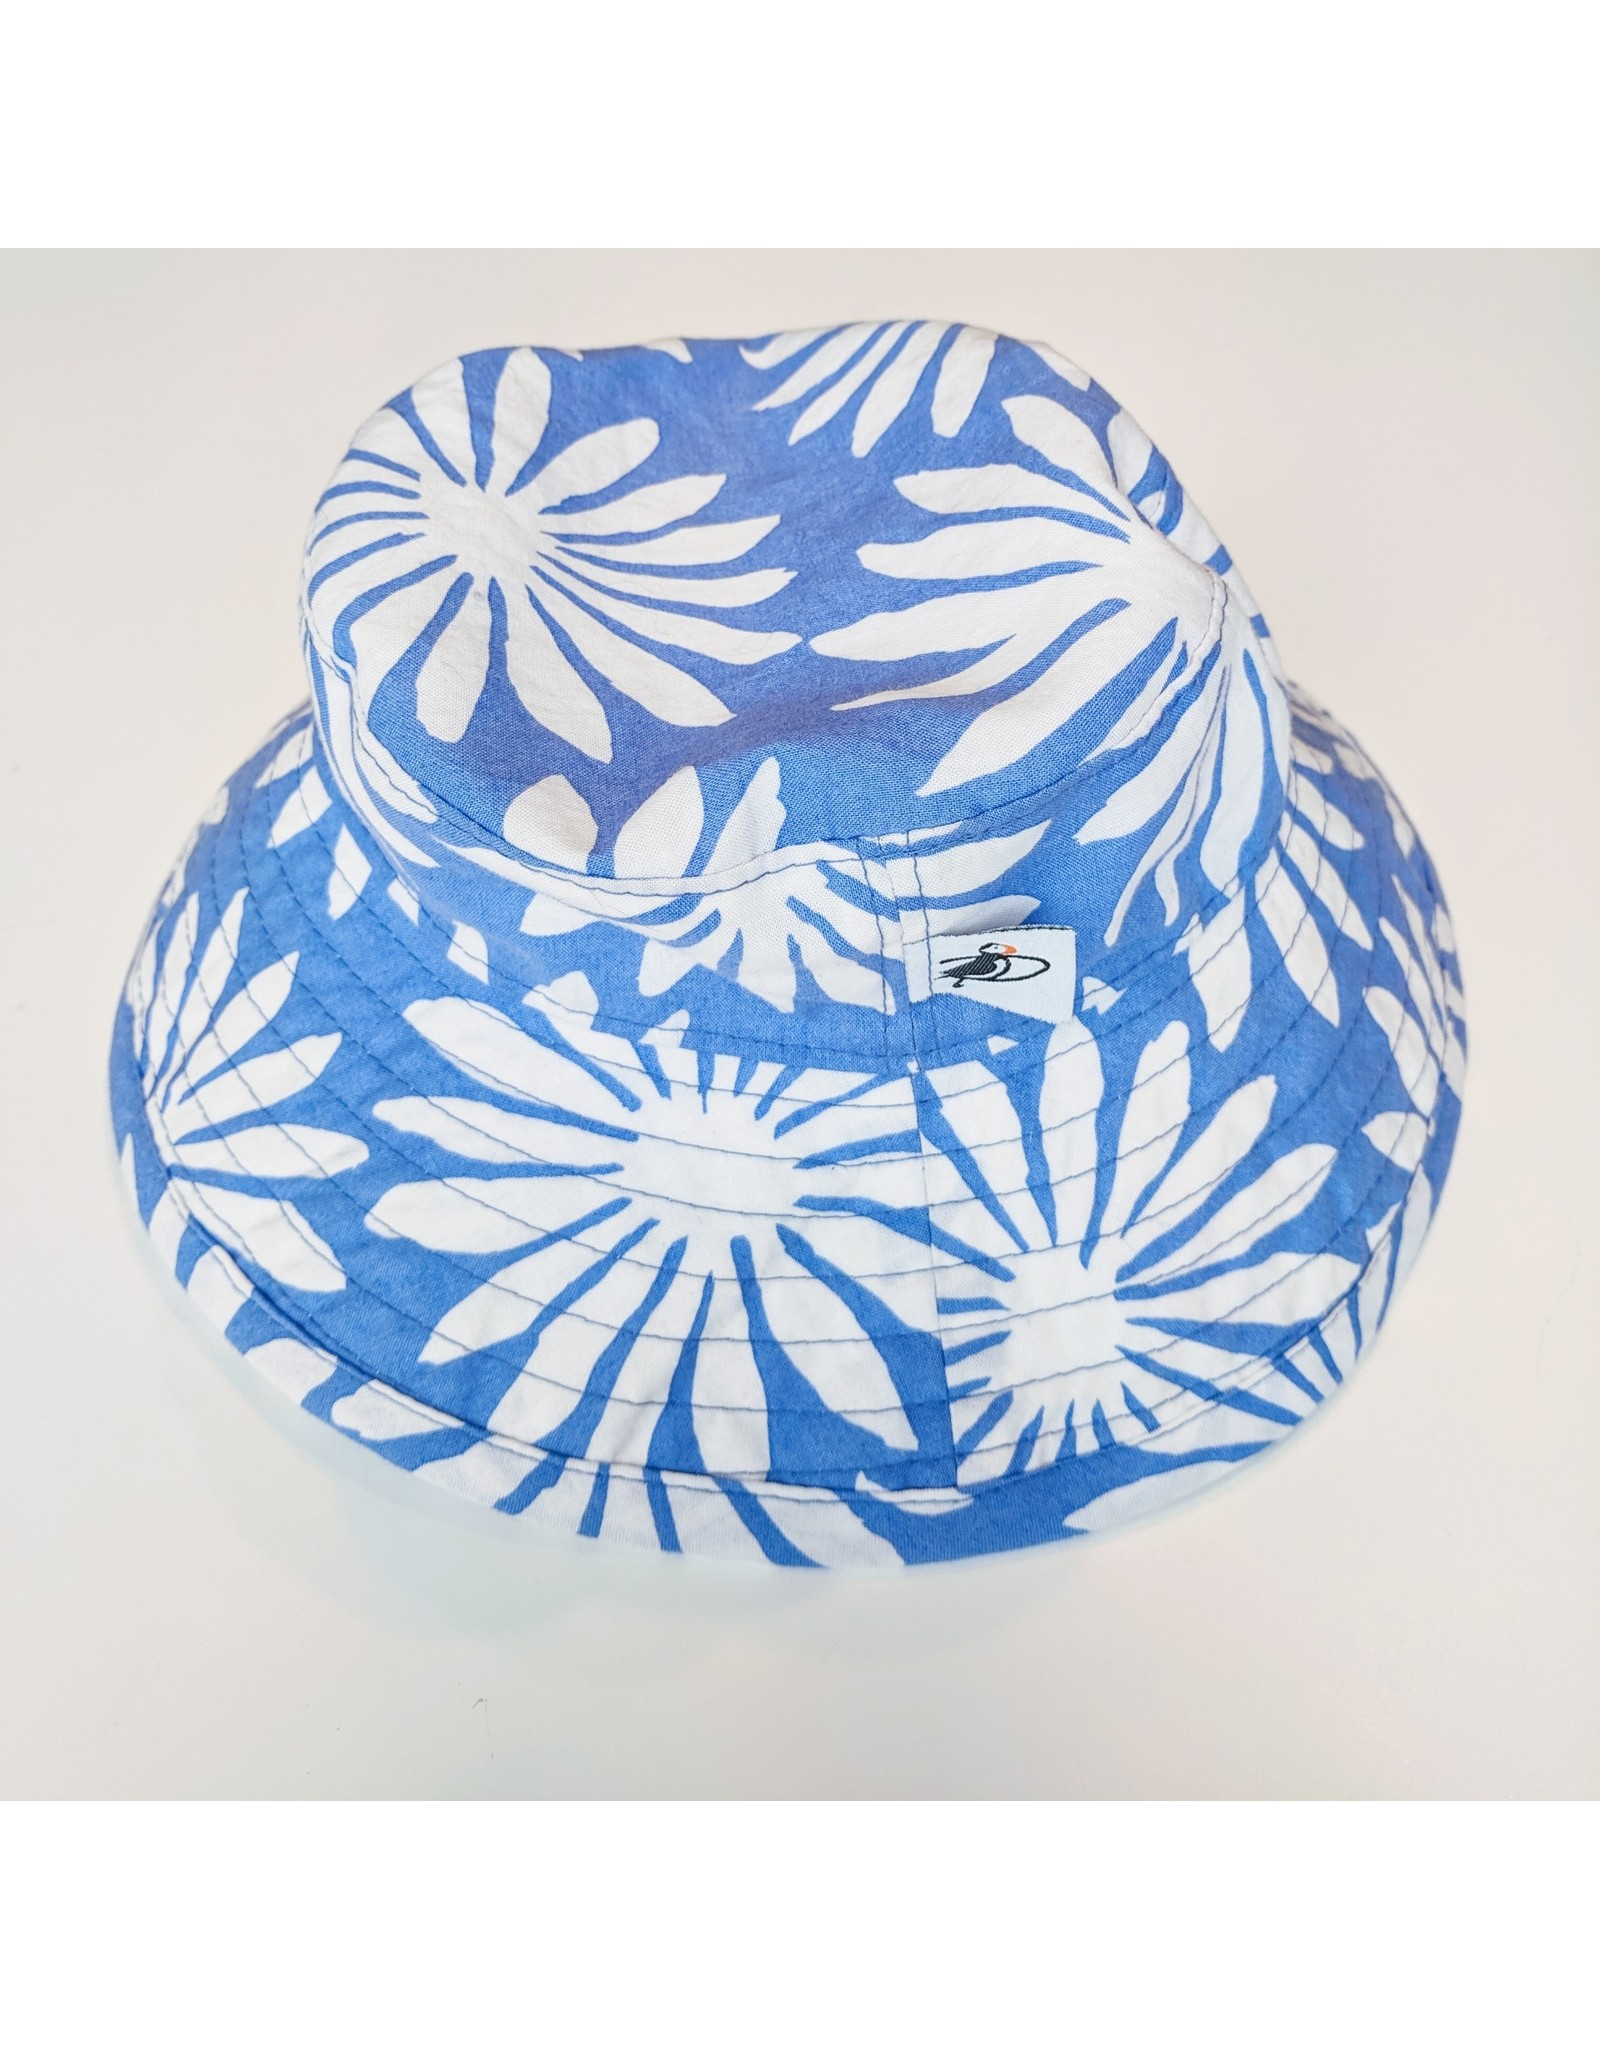 Puffin Gear Sunbaby Hat, Blue Daisy, 3-6 months